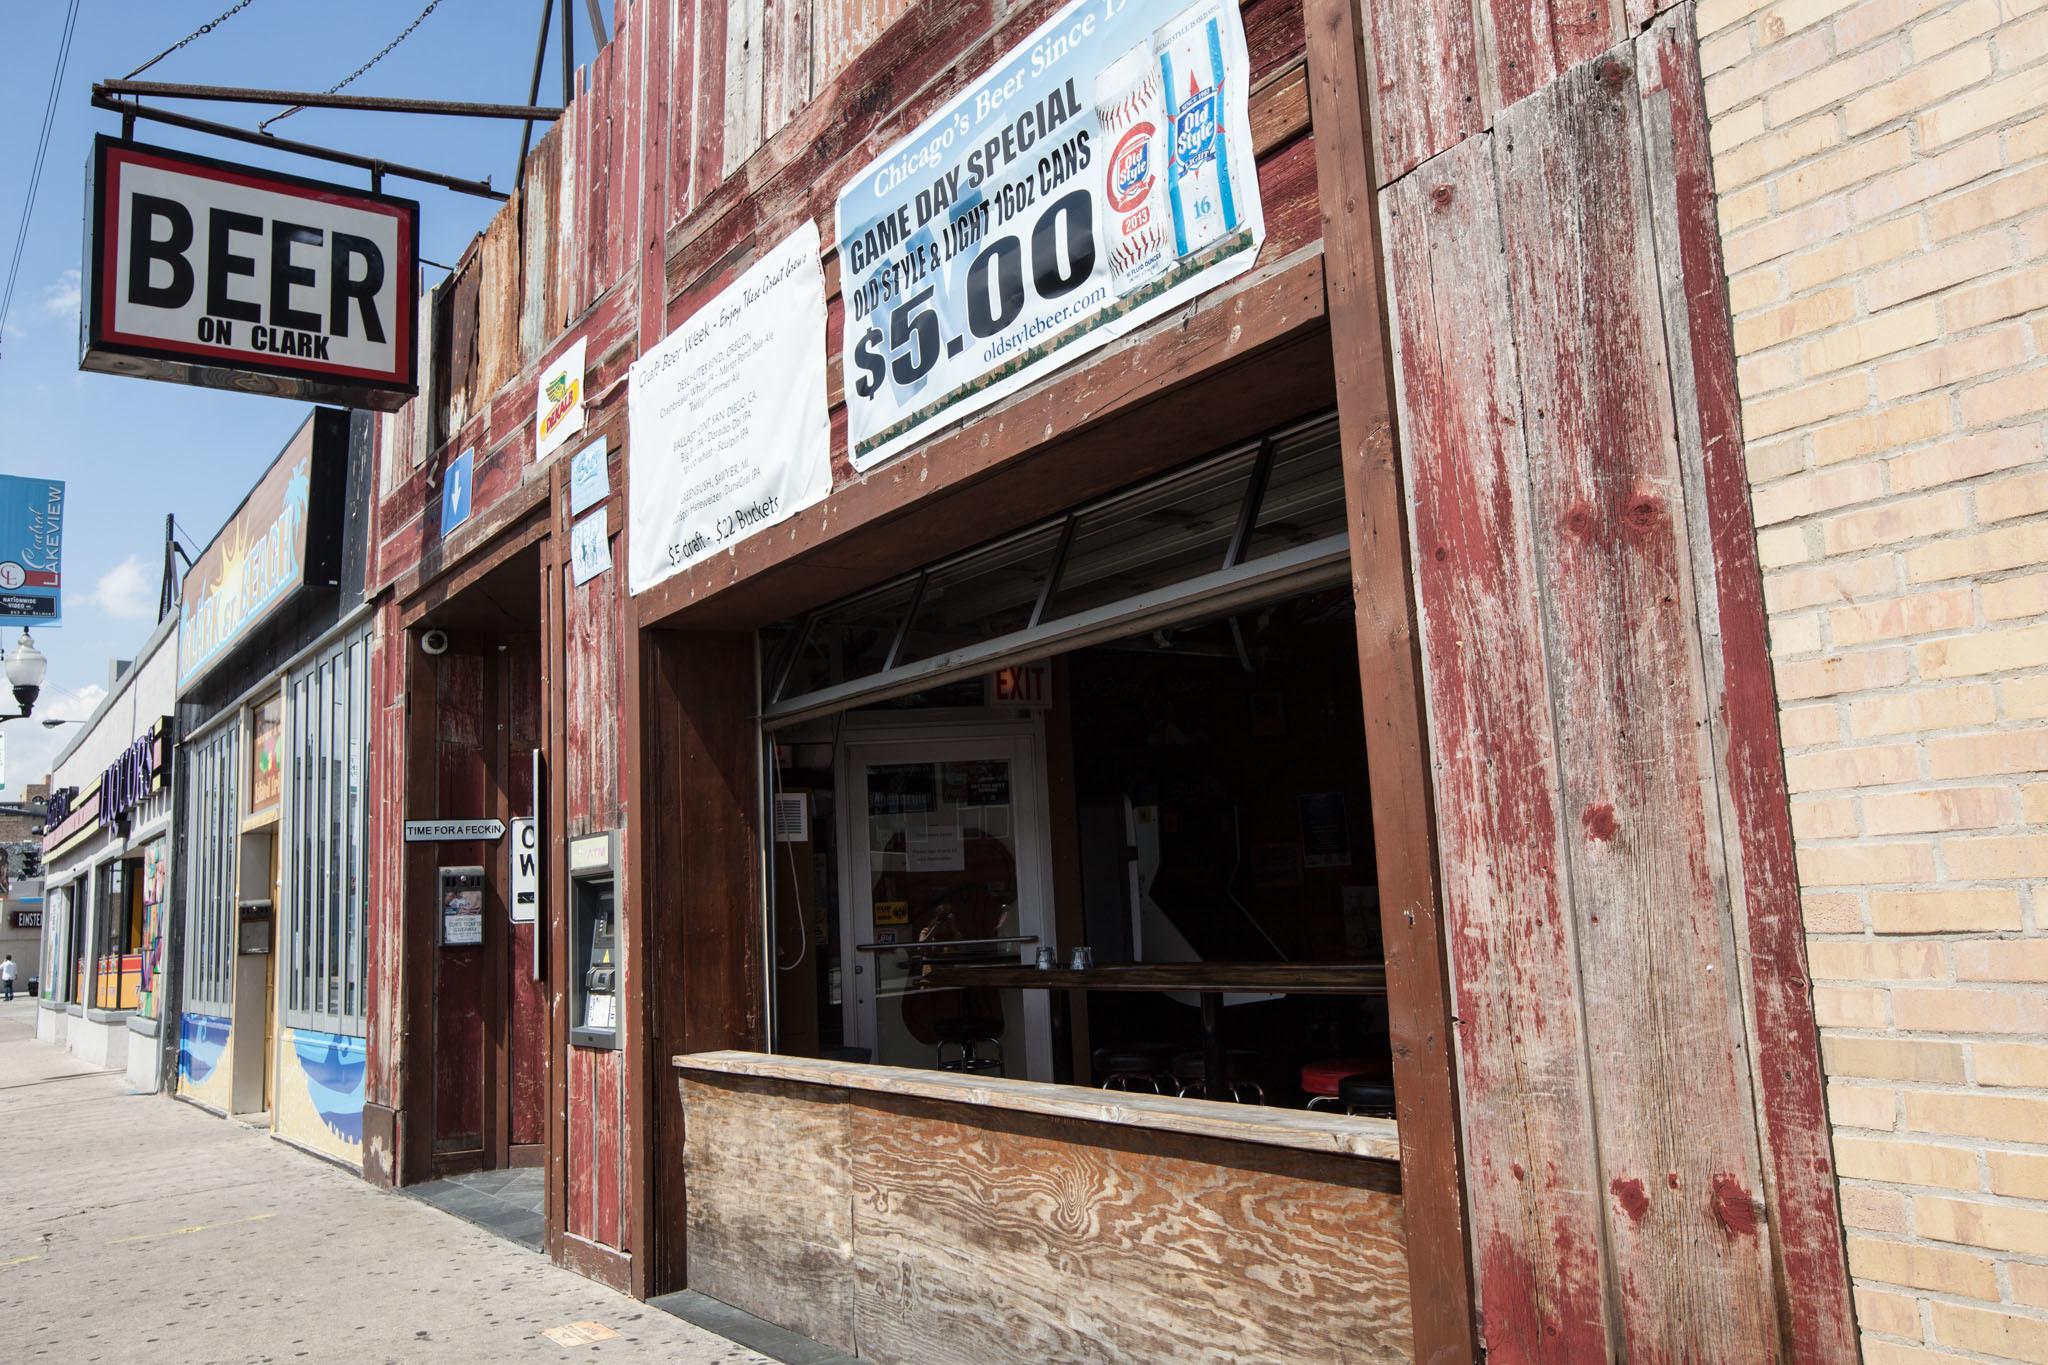 Clark Street (Addison to Belmont)